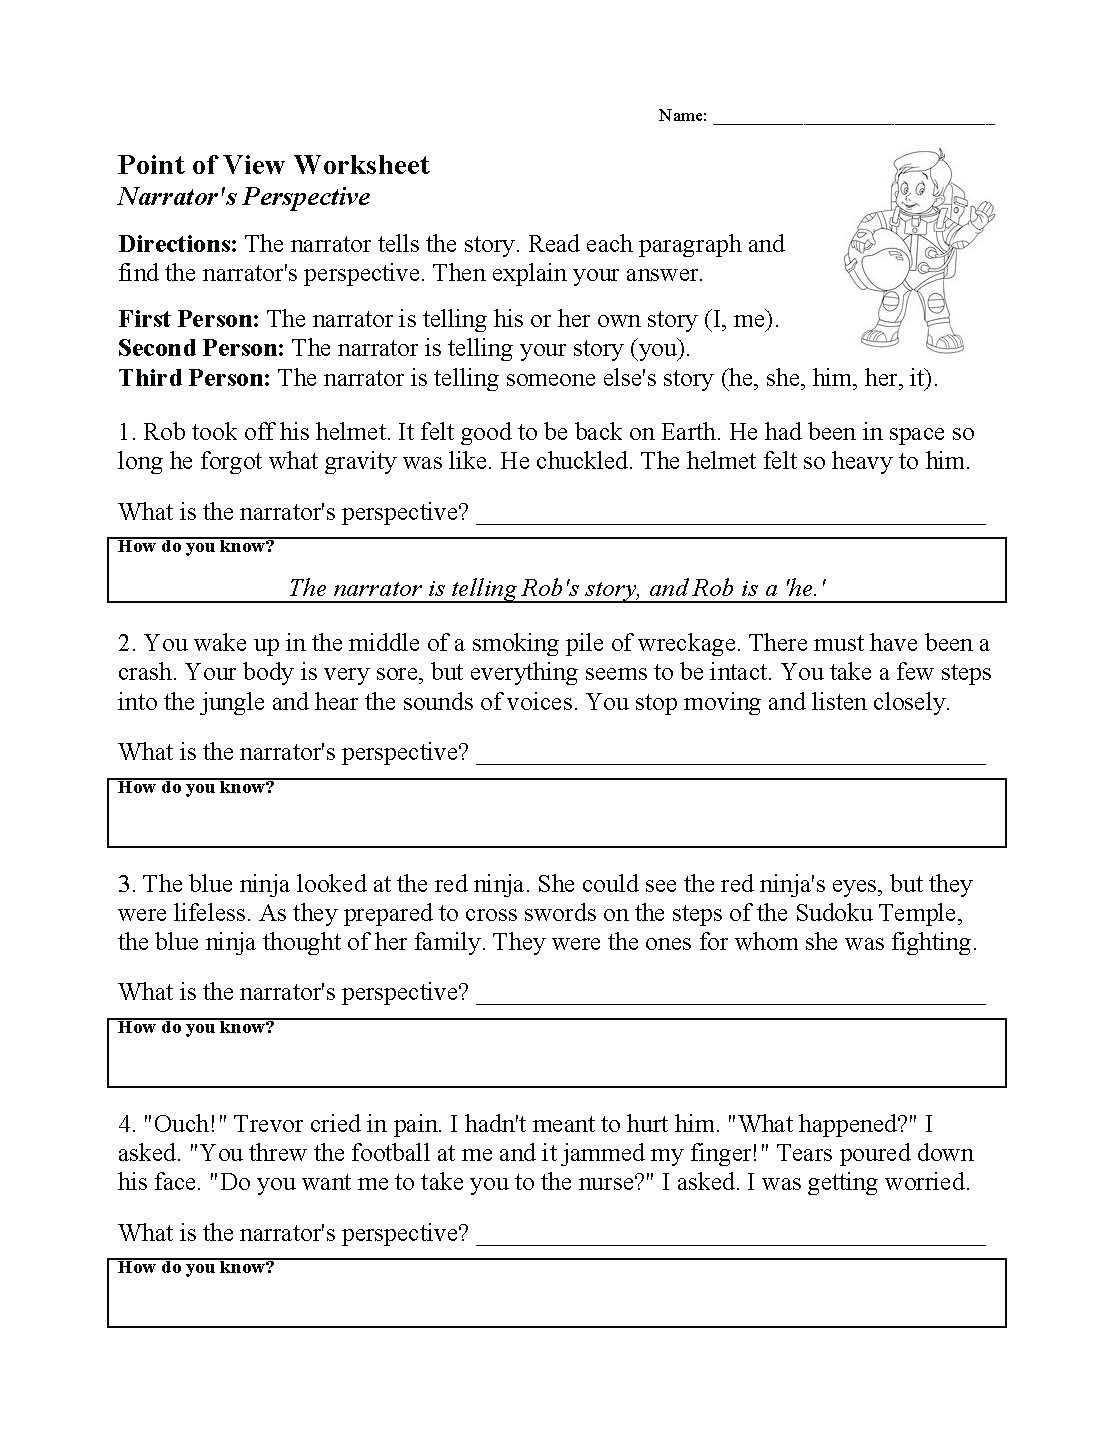 Elements Of Fiction Worksheets